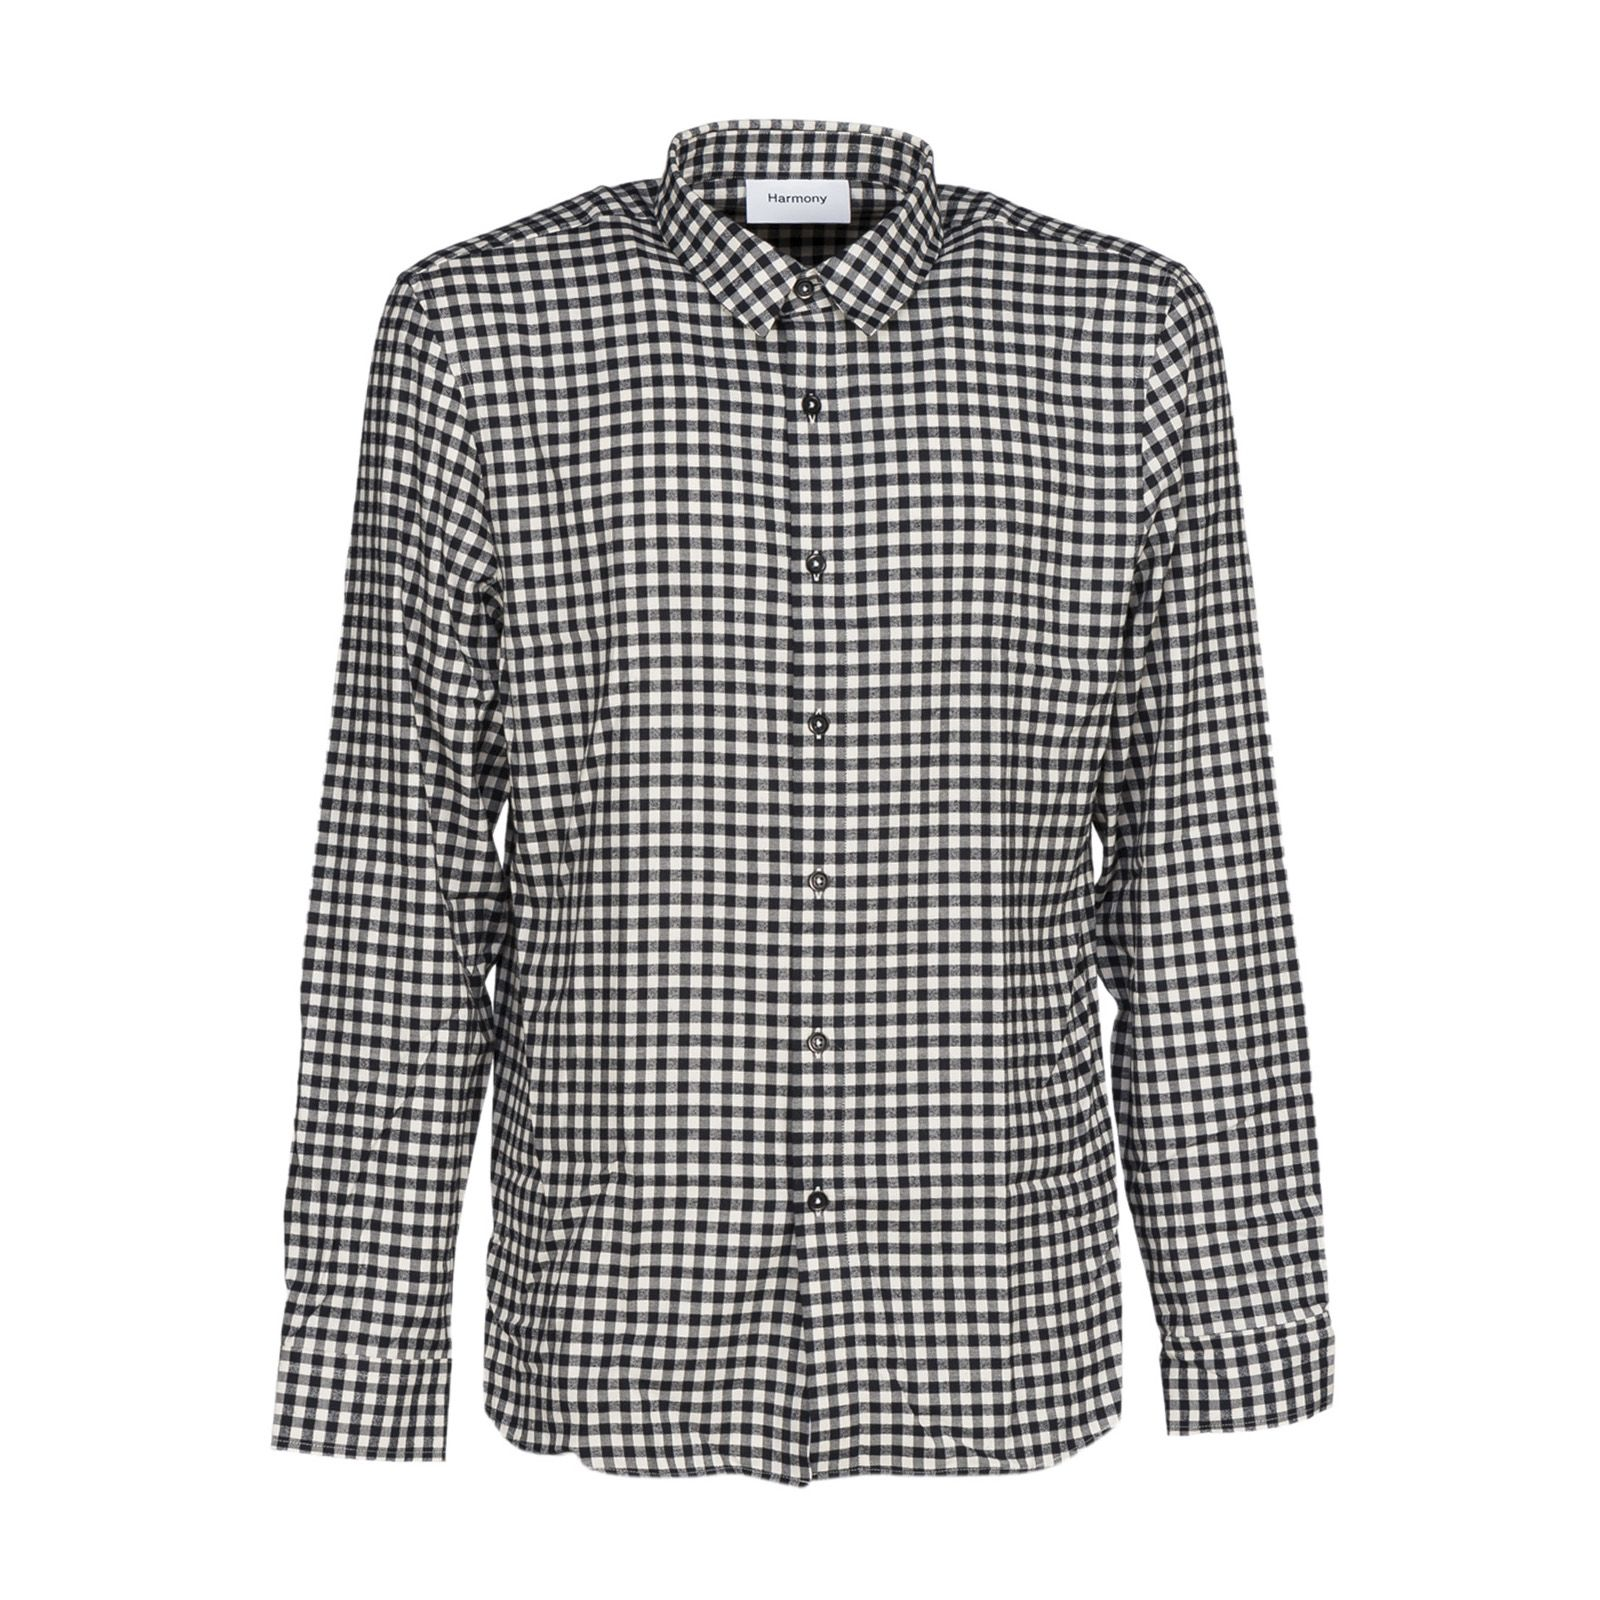 Harmony Paris Gingham Check Shirt